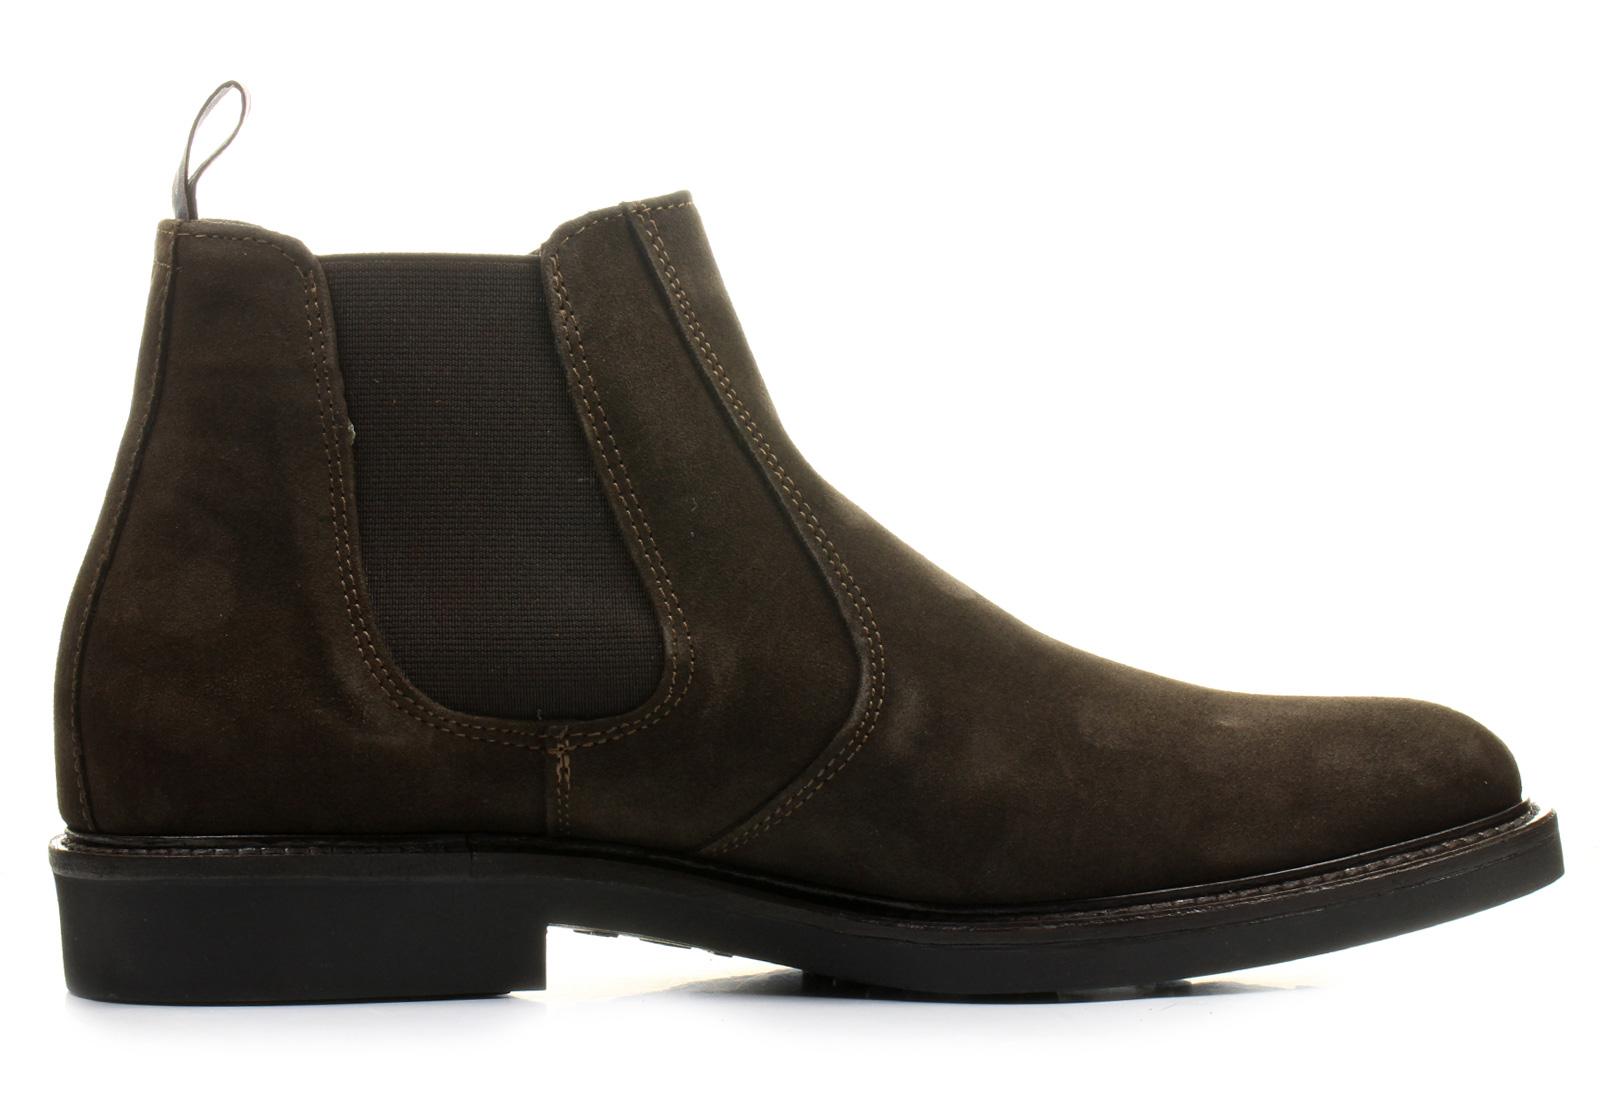 8243ae691c Gant Csizma - Spencer Chelsea - 11653702-G46 - Office Shoes Magyarország